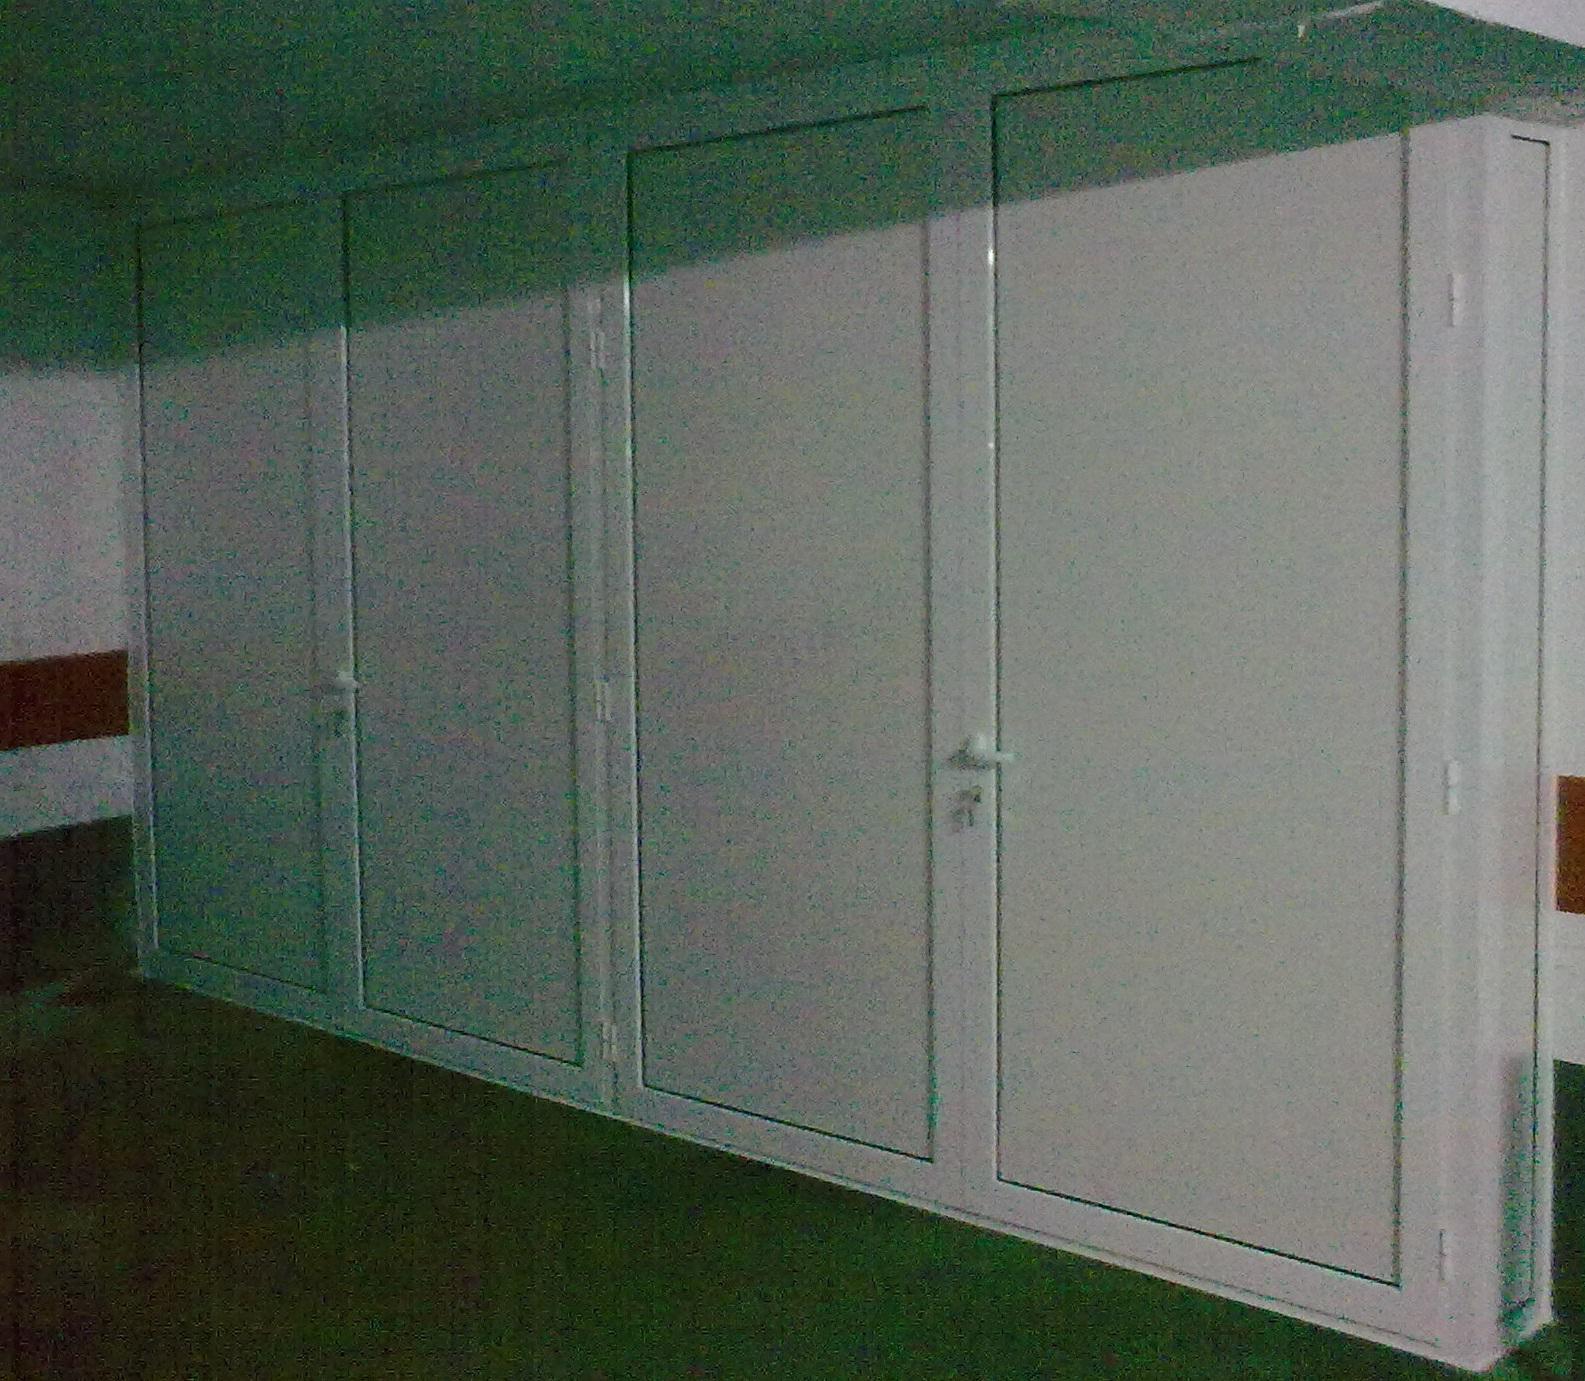 Armario De Aluminio En Color Blanco Para Un Cliente ~ Armarios De Aluminio Para Exterior